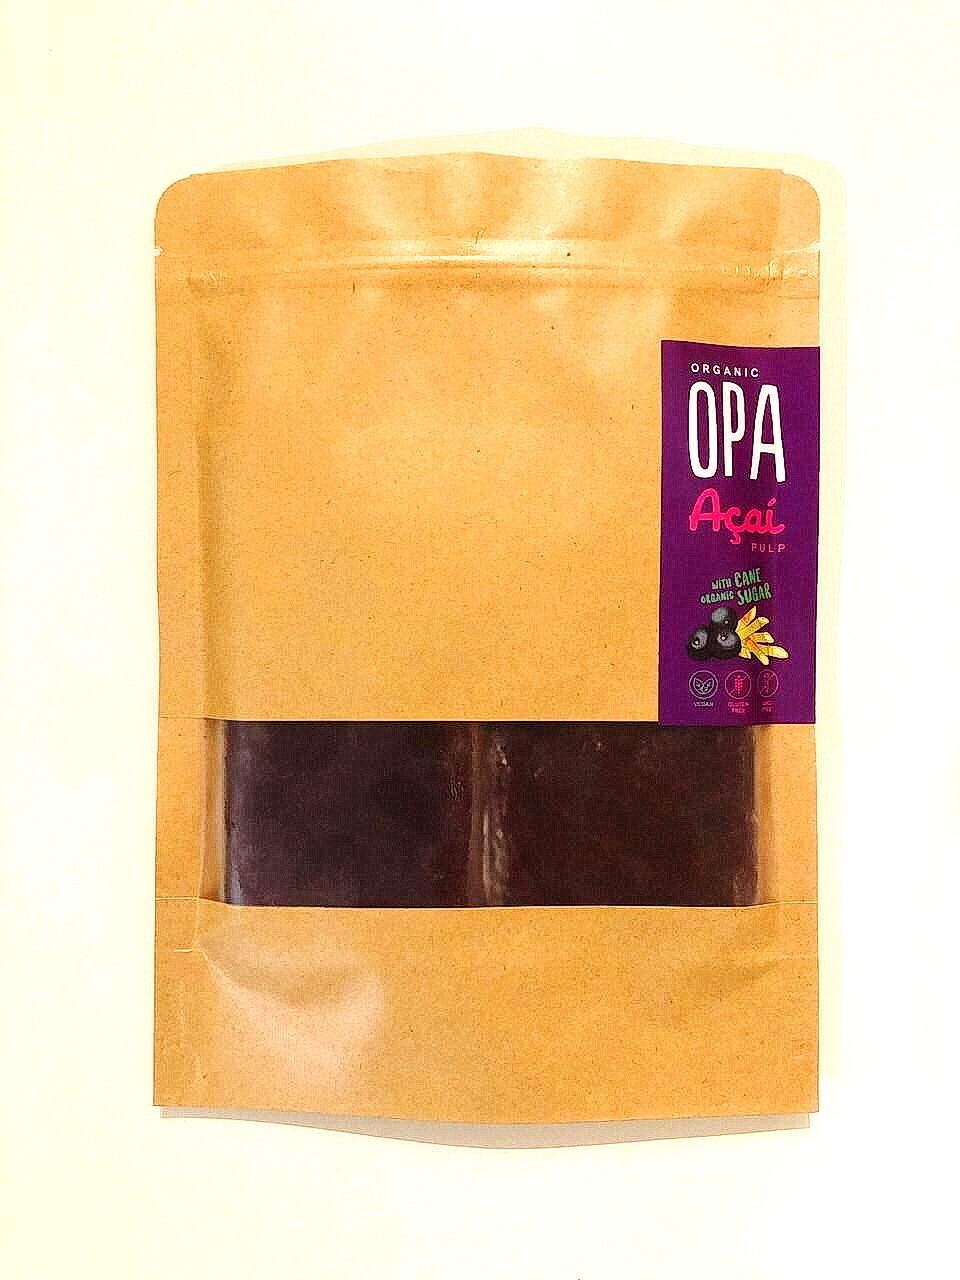 Frozen Acai Pulp/ Sugar Cane (Bag) - Organic Opa